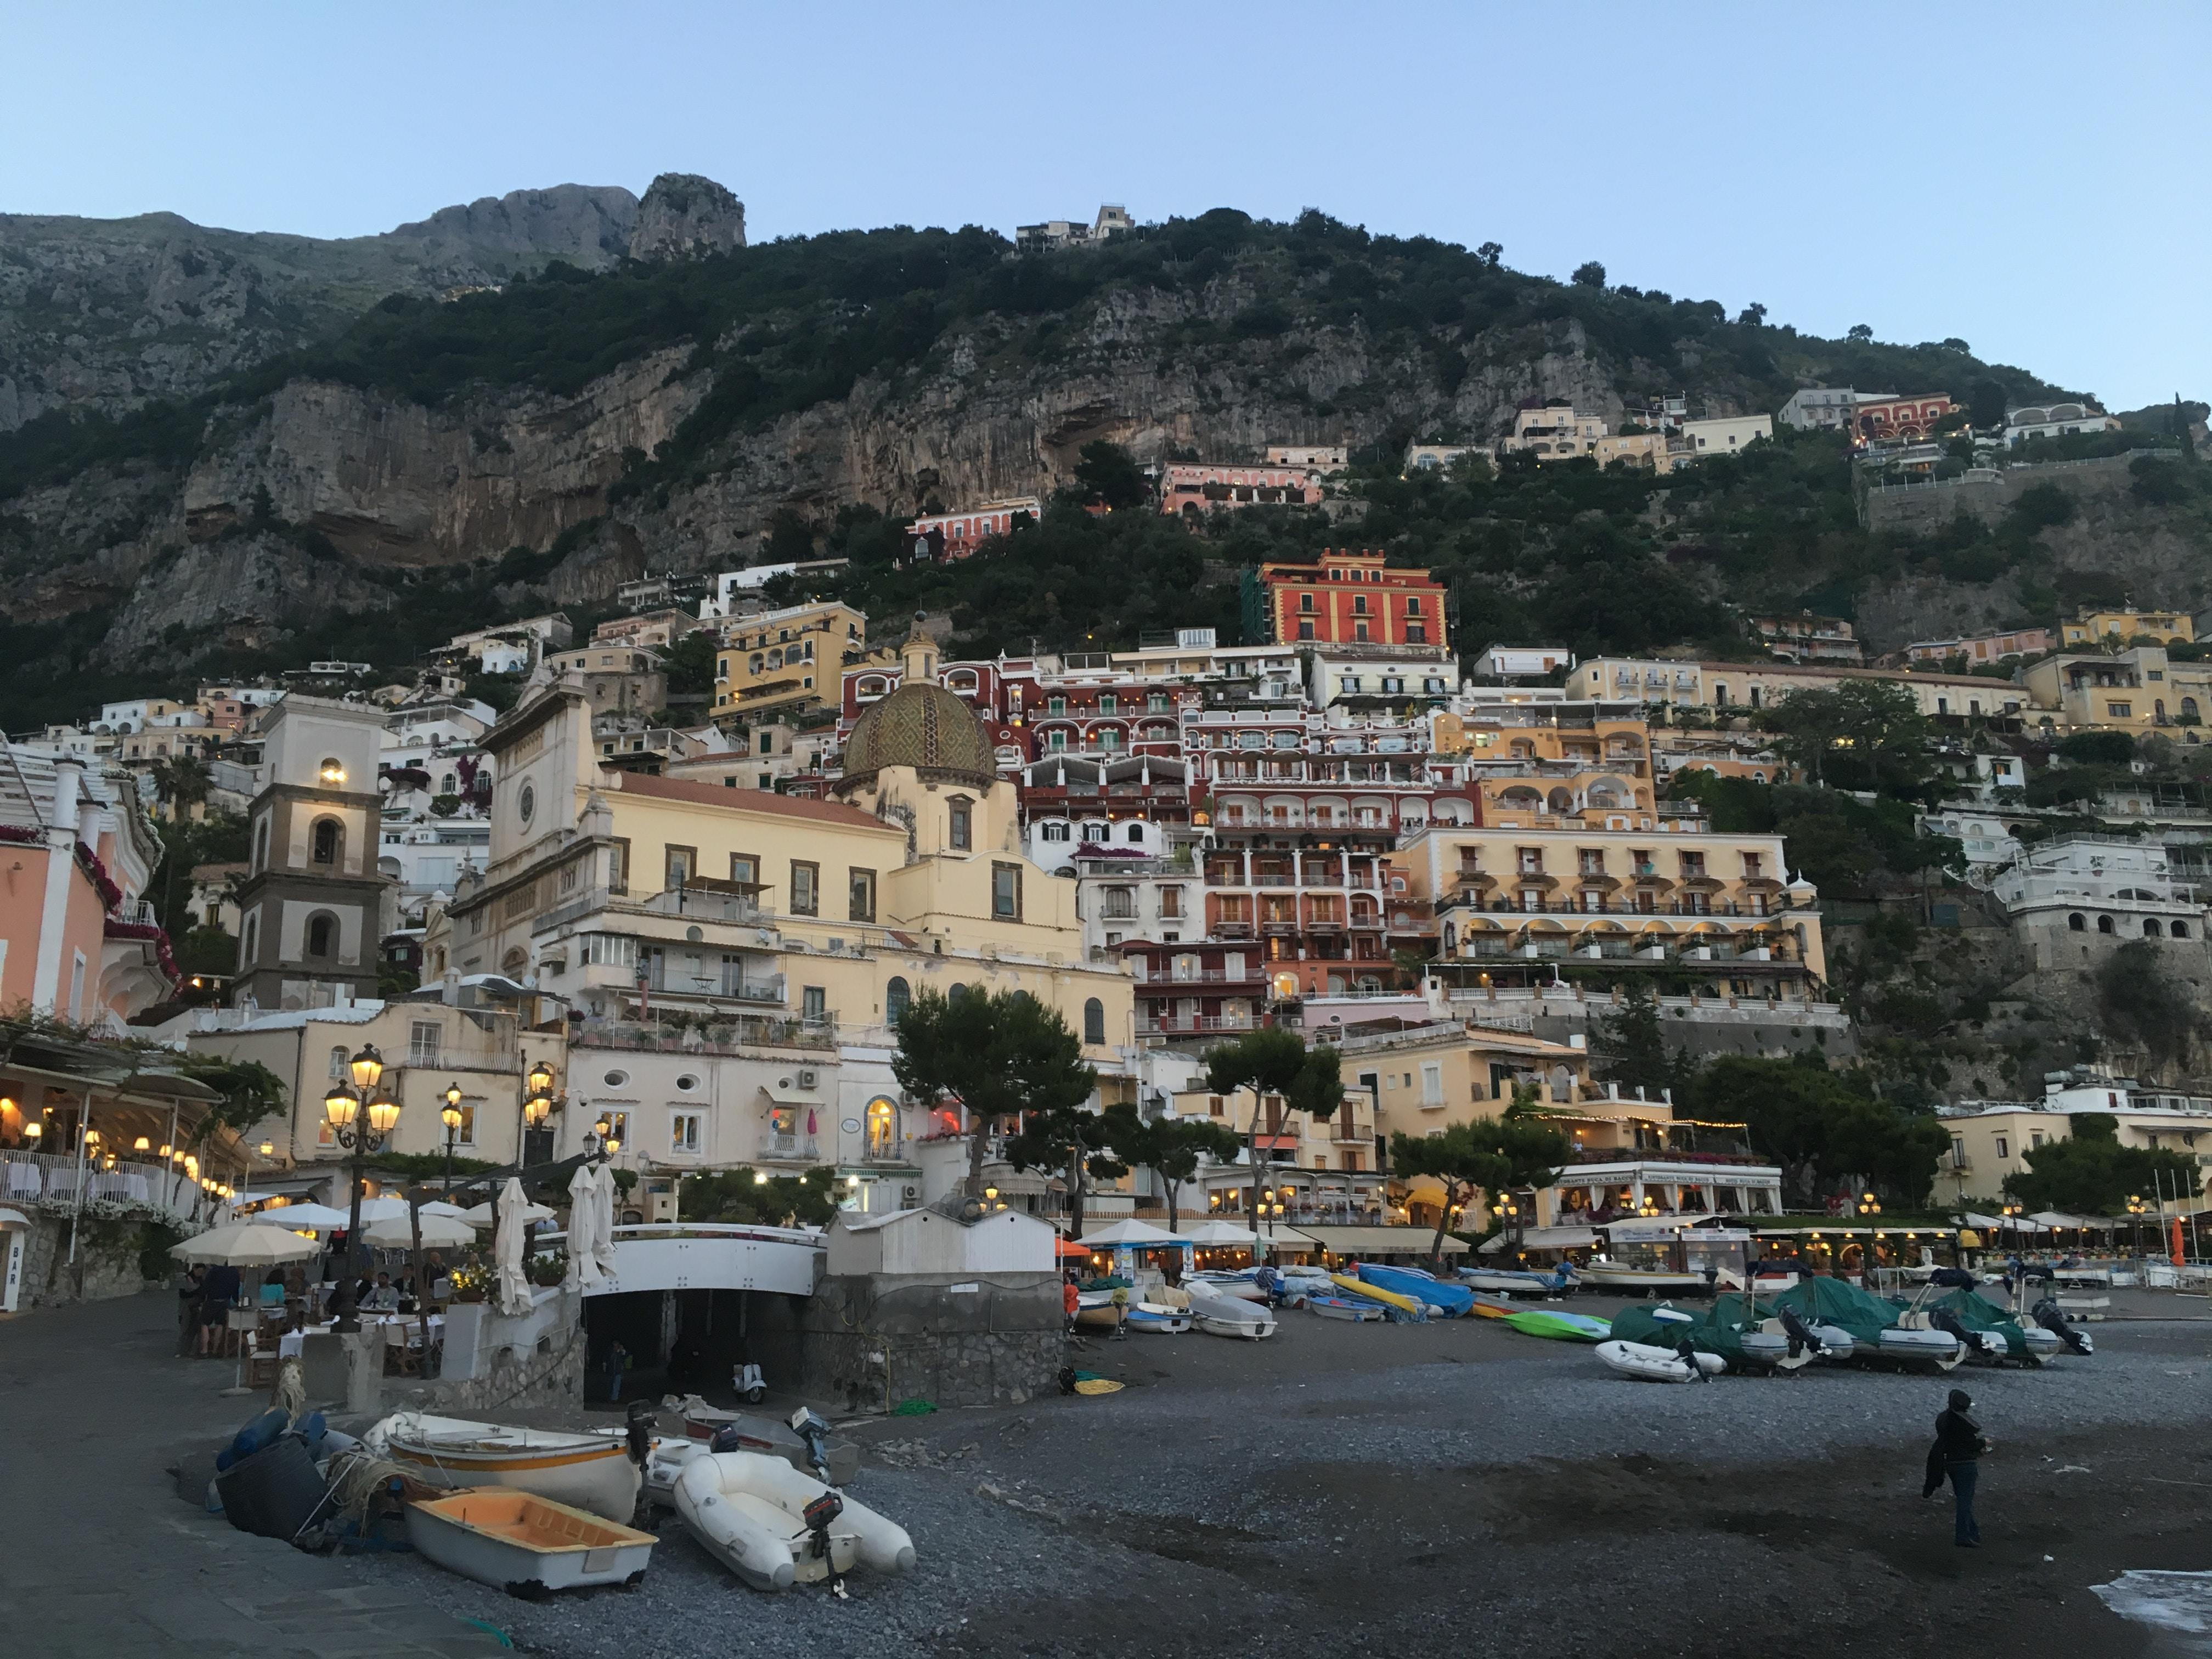 urban city near seashore during dayitme